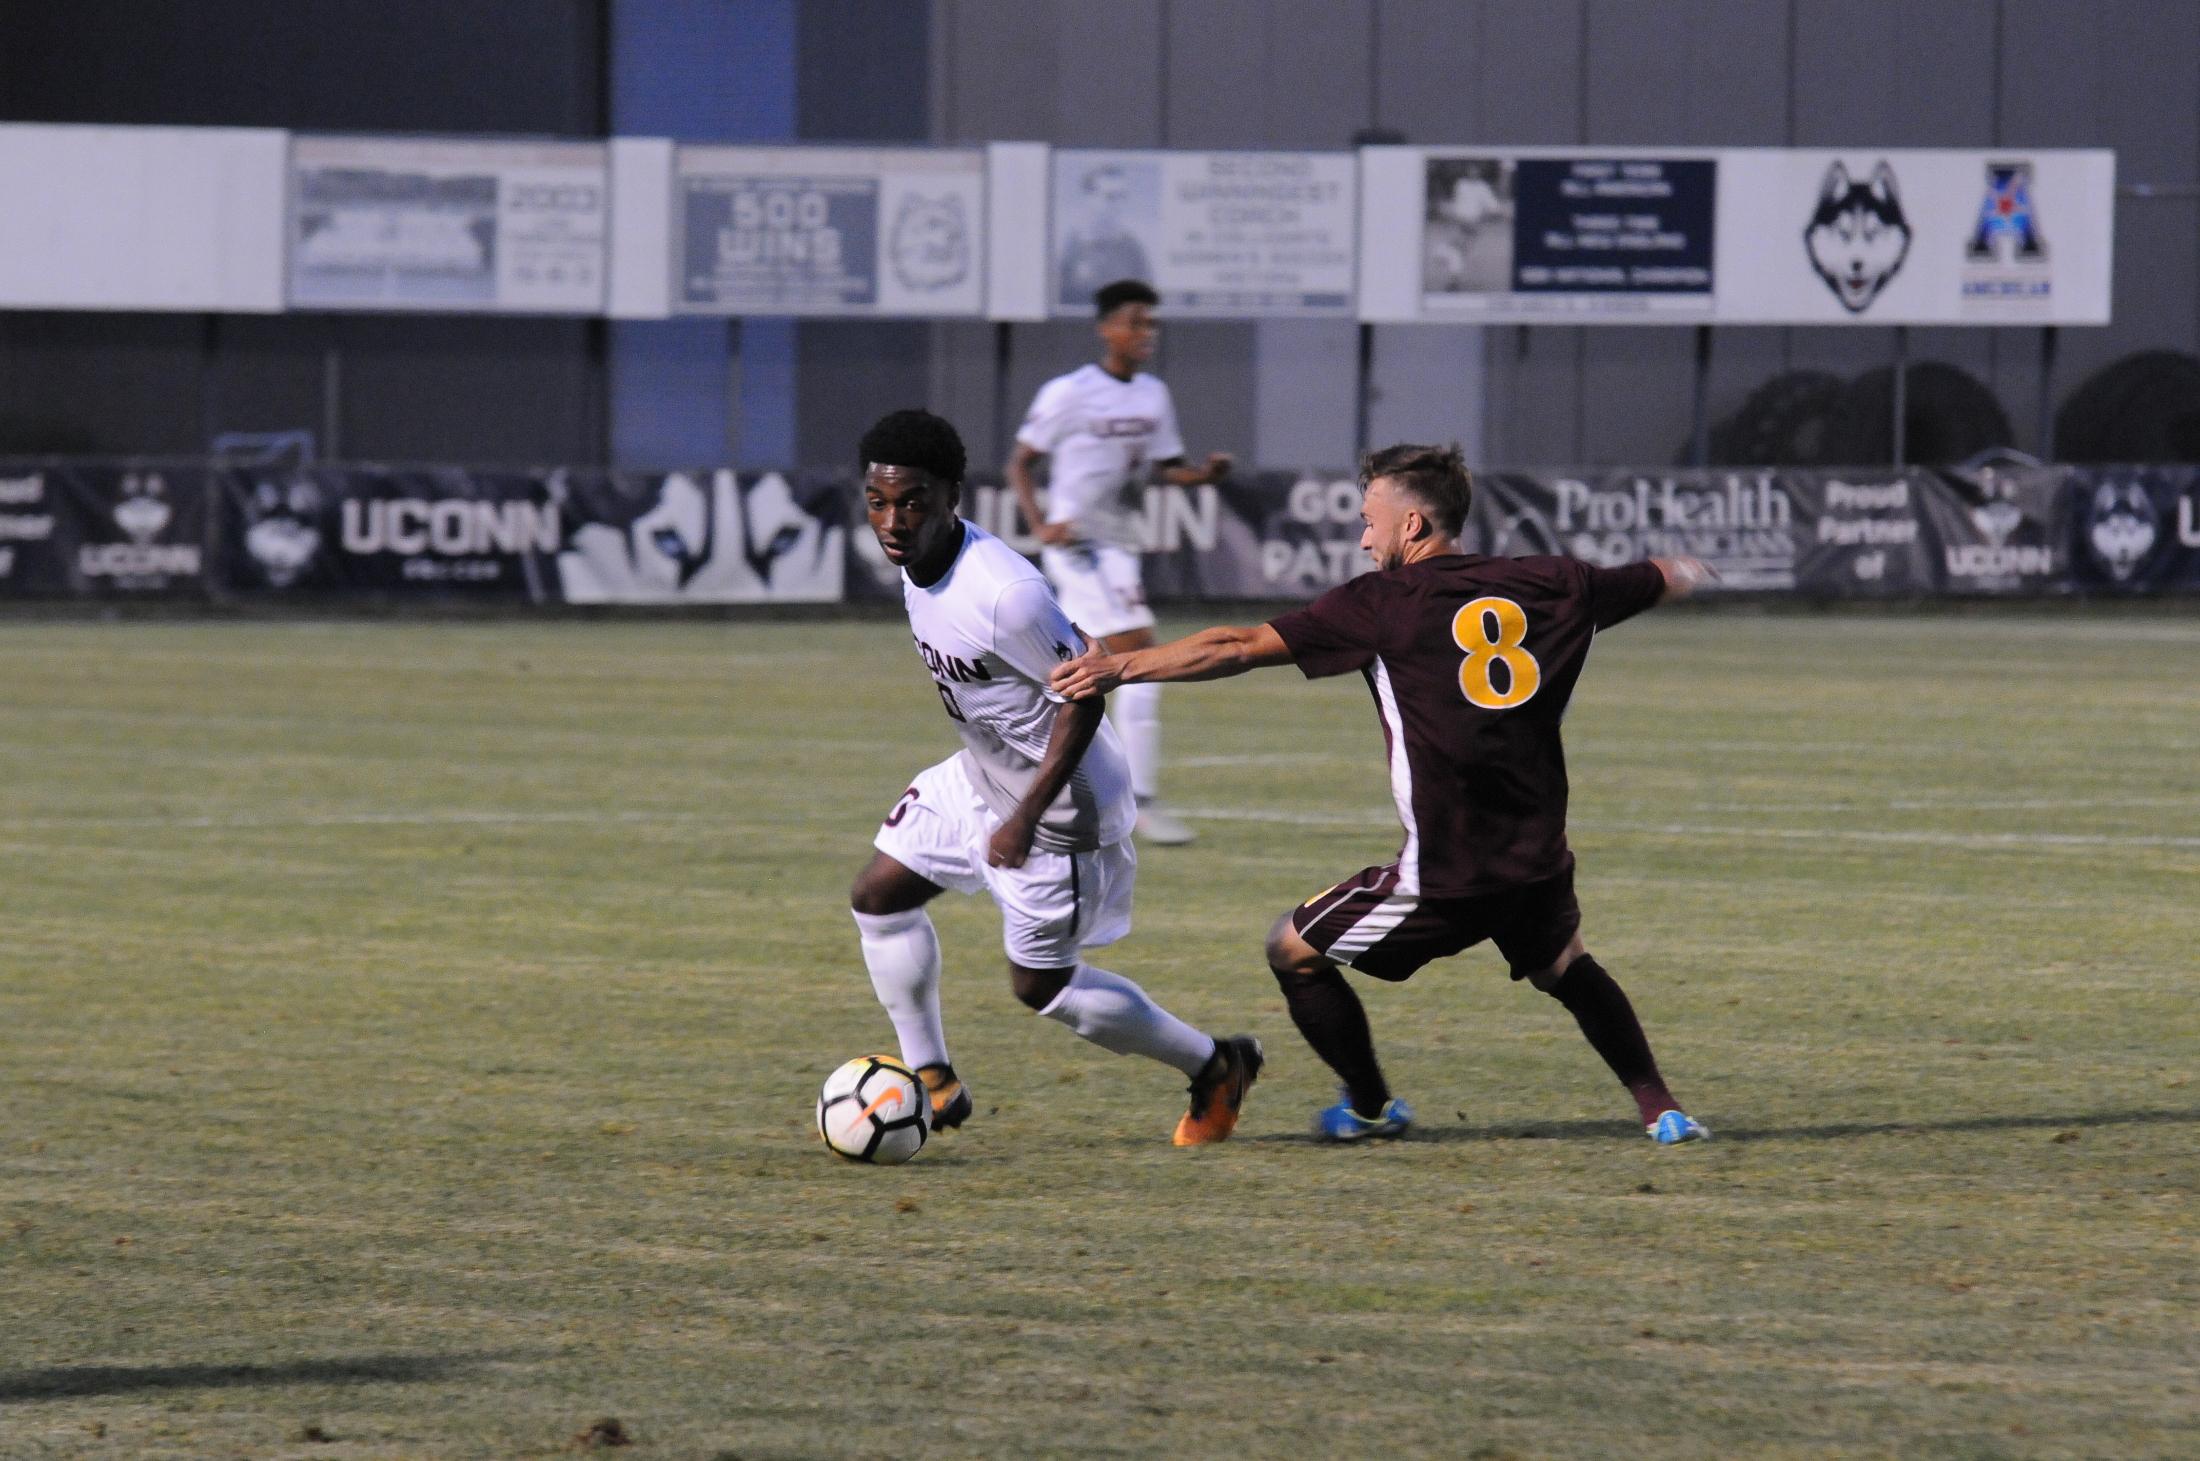 Freshman Josh Burnett makes a move on the Iona defense. (Olivia Stenger/The Daily Campus)